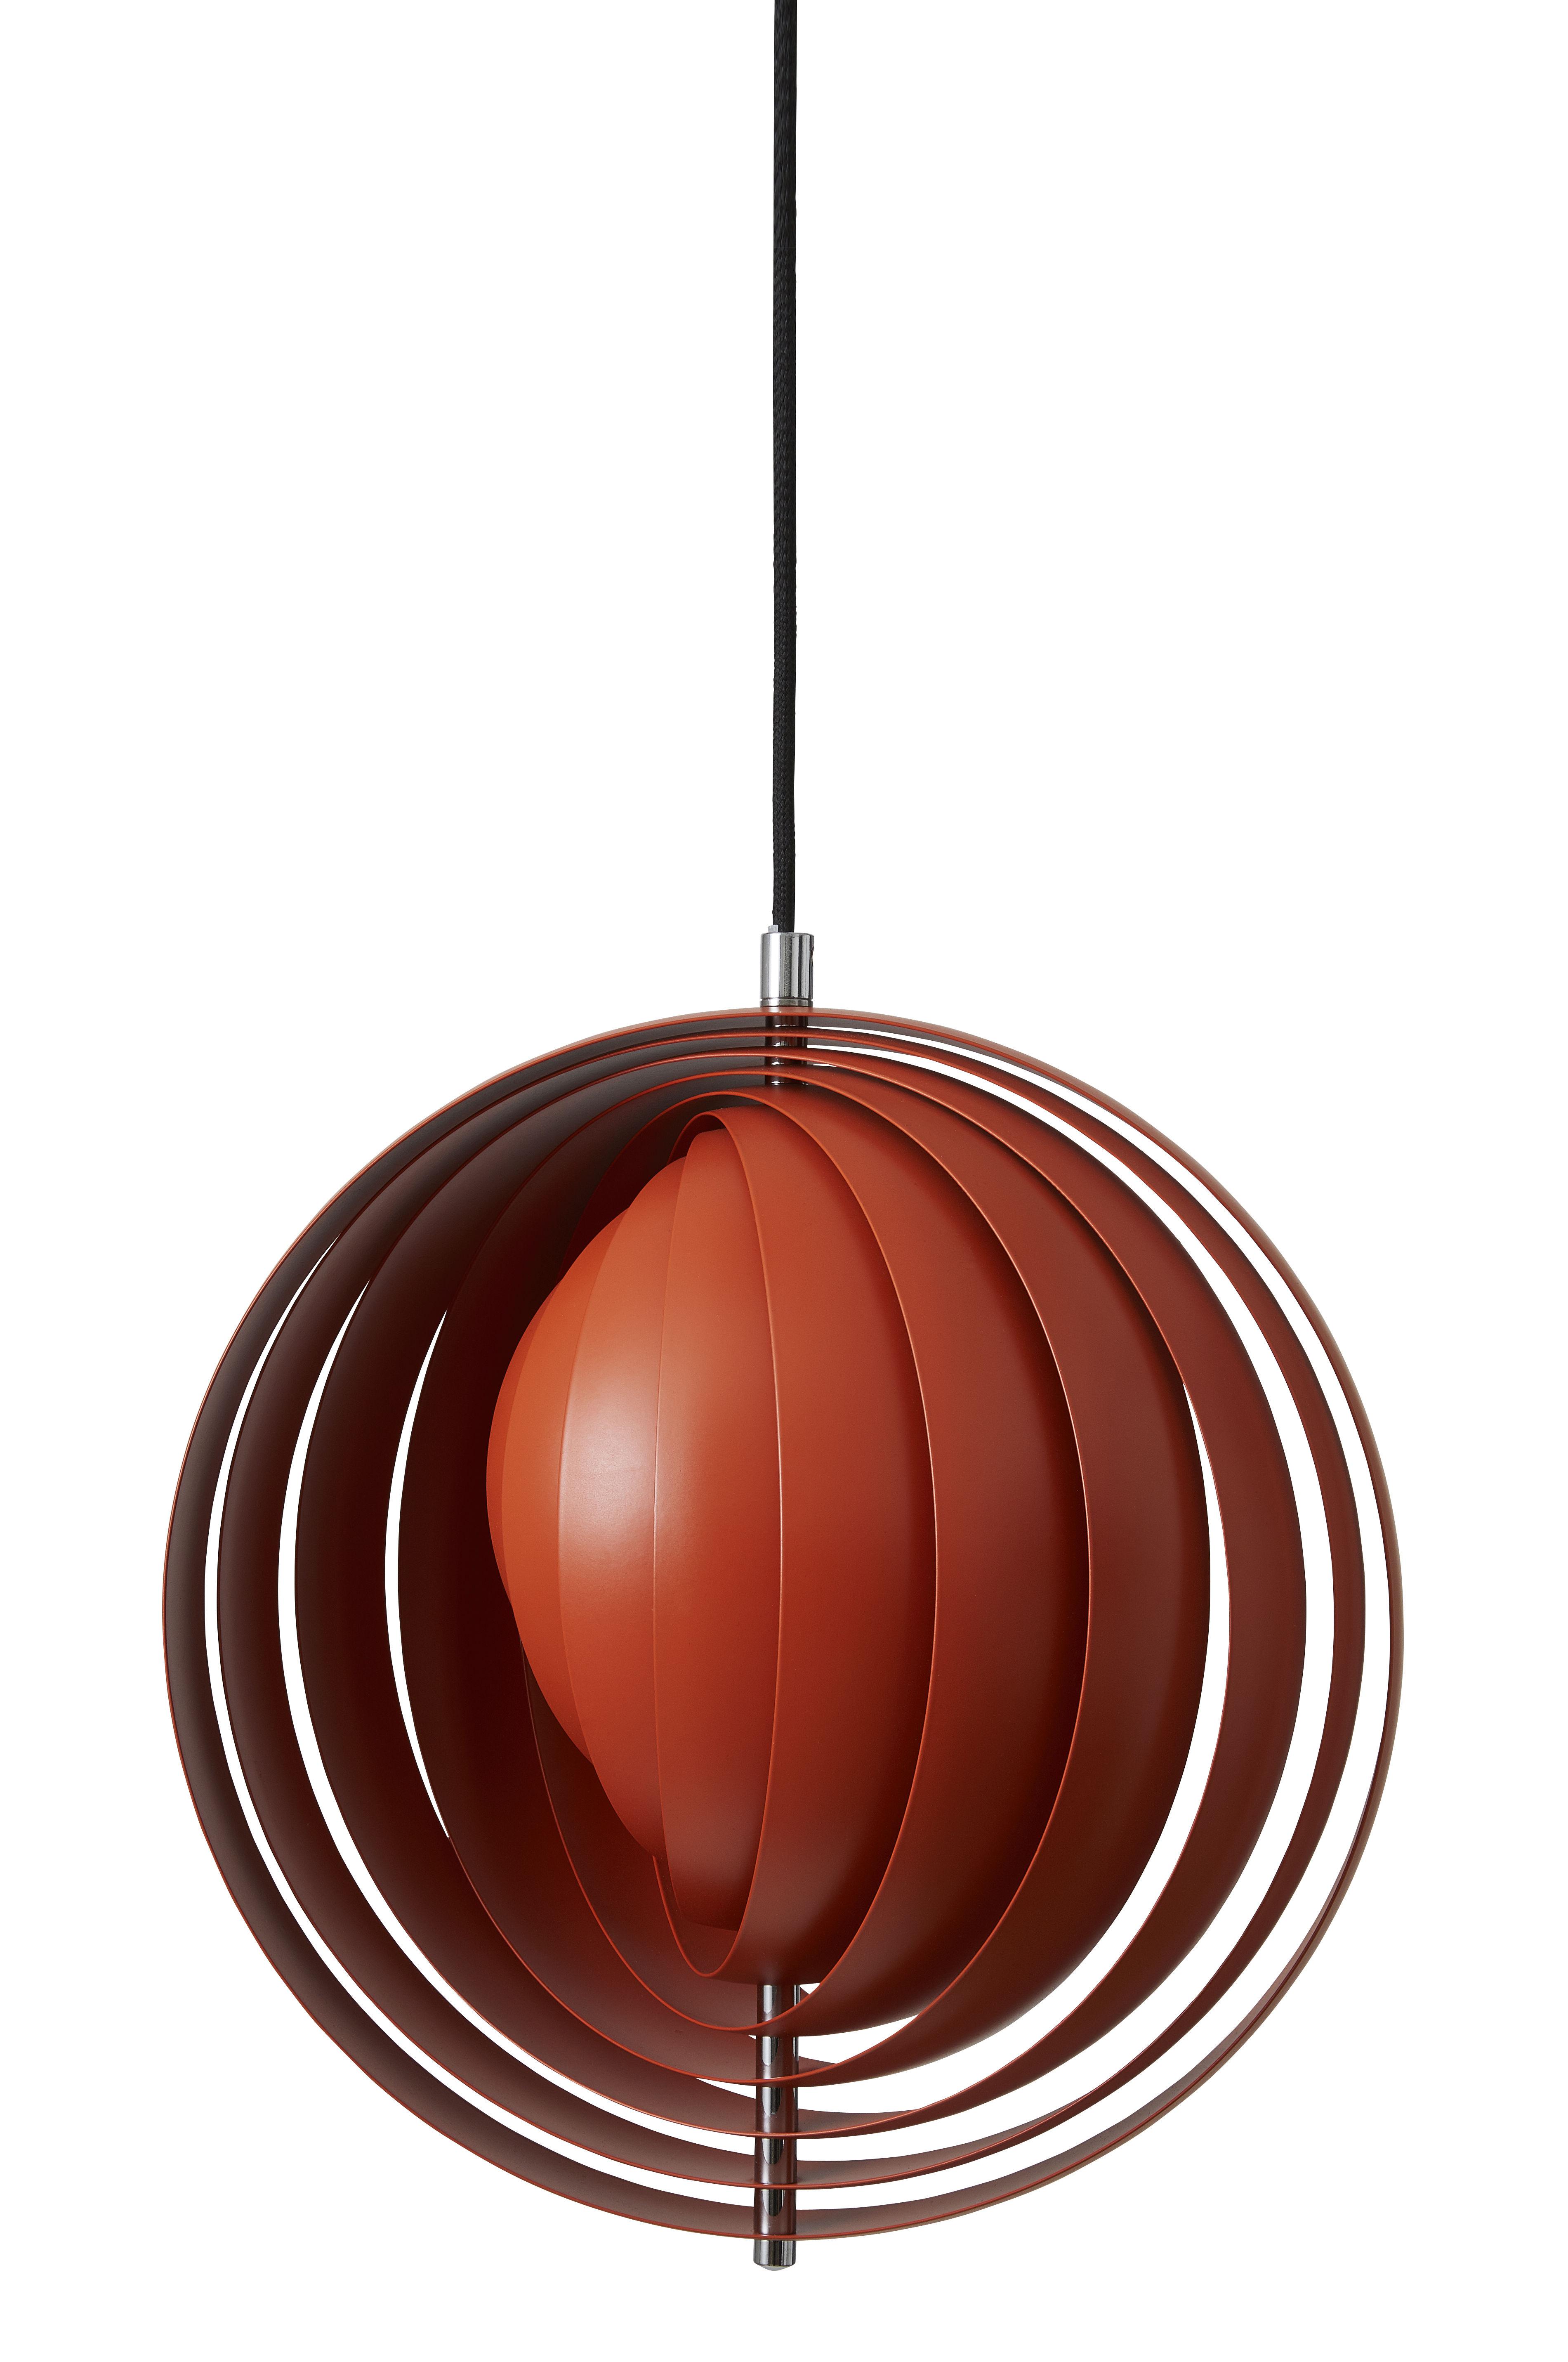 Lighting - Pendant Lighting - Moon Pendant - / Ø 34 cm - Panton 1960 by Verpan - Orange - Varnished metal